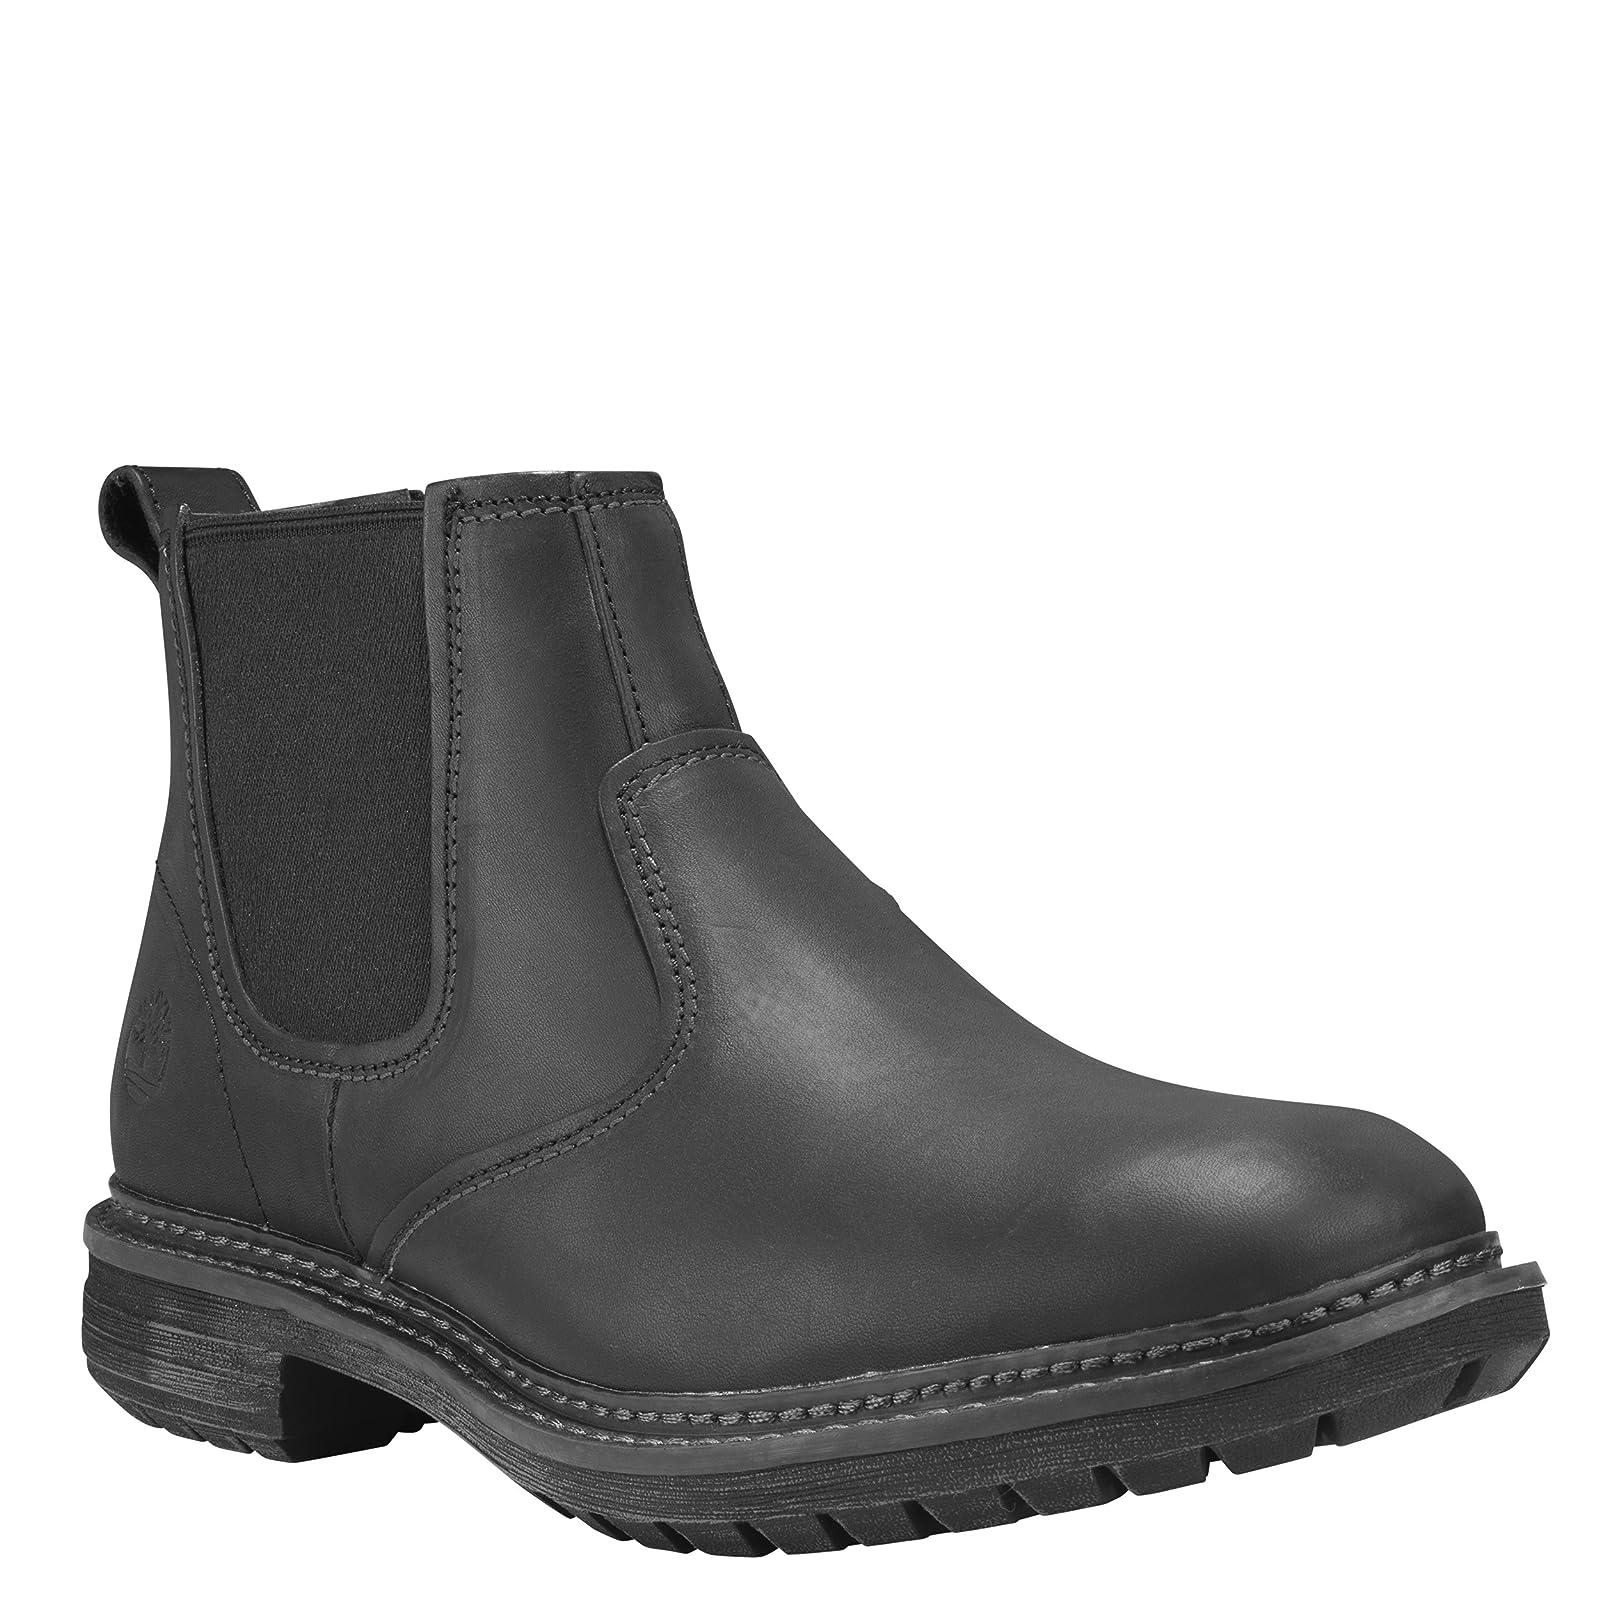 Timberland Men's Logan Bay Chelsea Boot A1V4Z Medium Brown Full Grain - 1